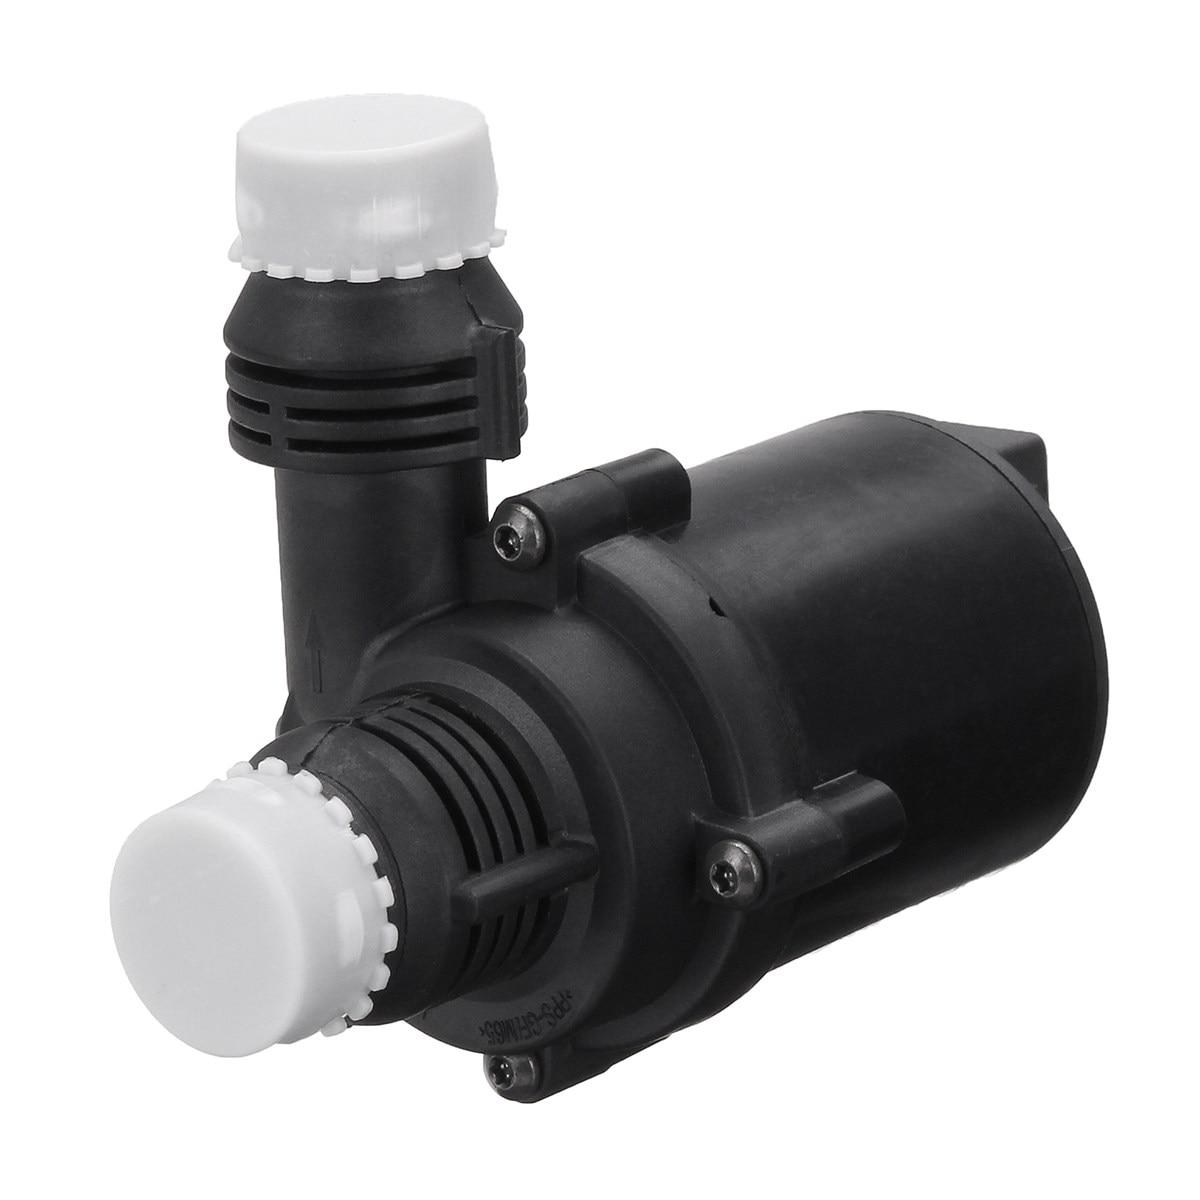 hight resolution of  64116903350 cooling water pump replacement for bmw e38 e39 e65 e66 e67 x5 e53 1994 1995 1996 1997 1998 1999 2000 2001 2002 2003